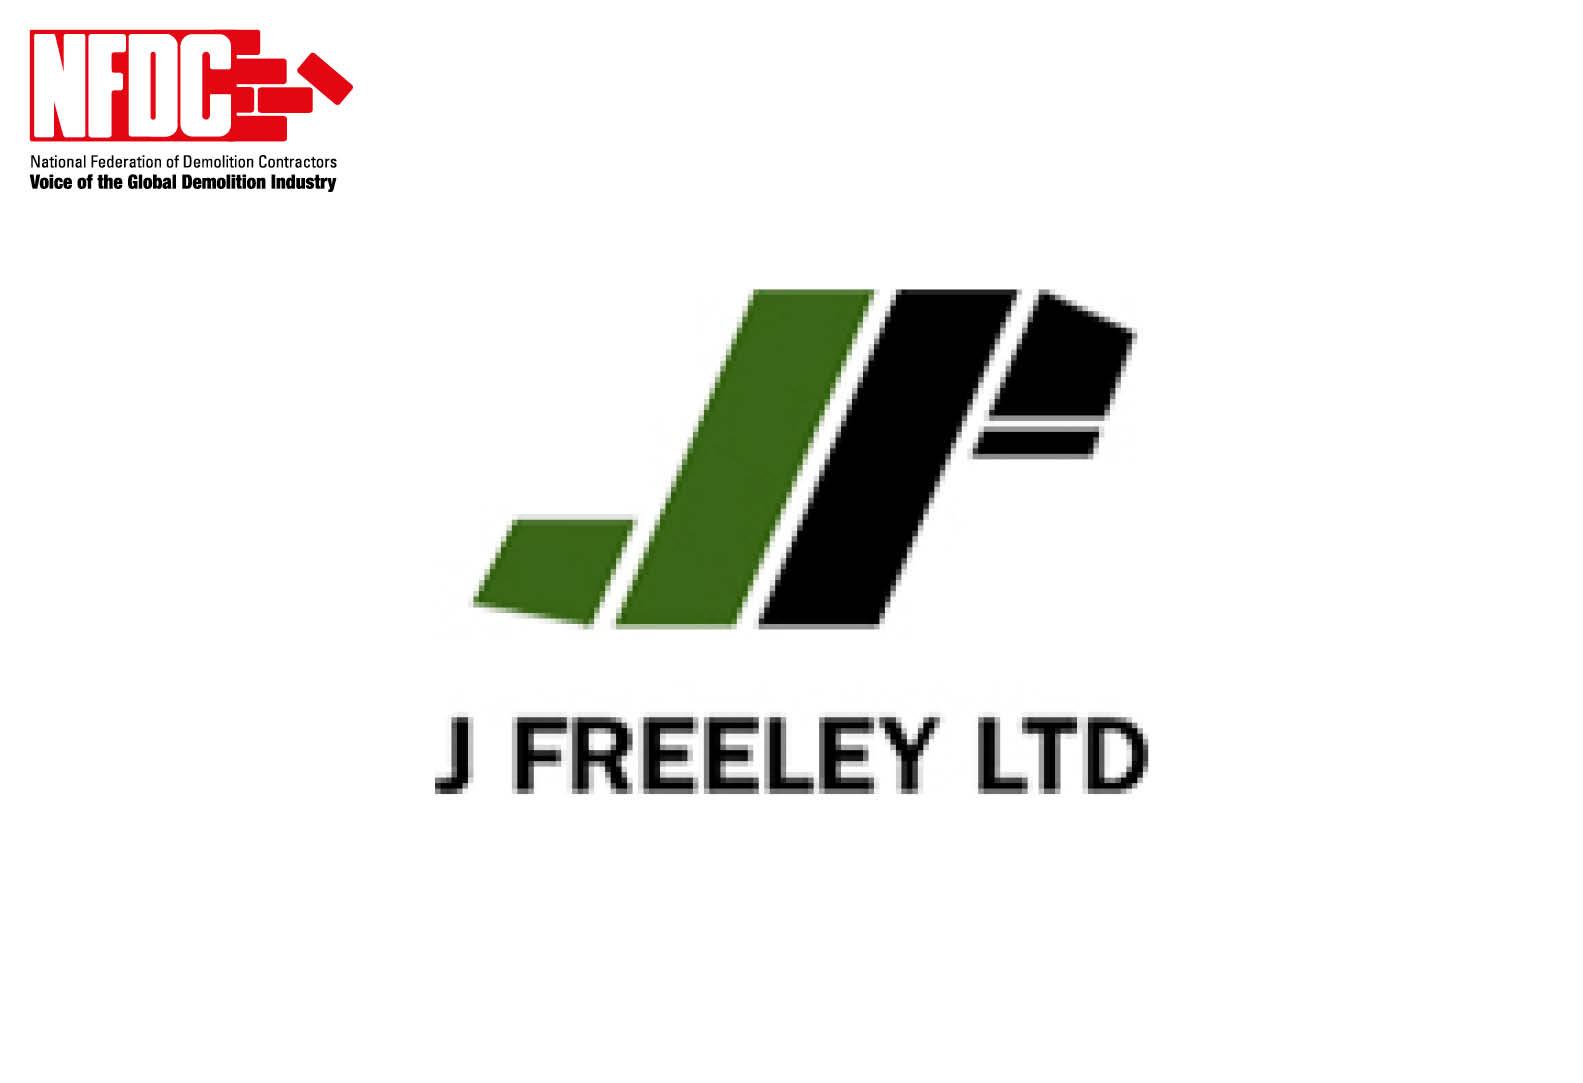 J Freely